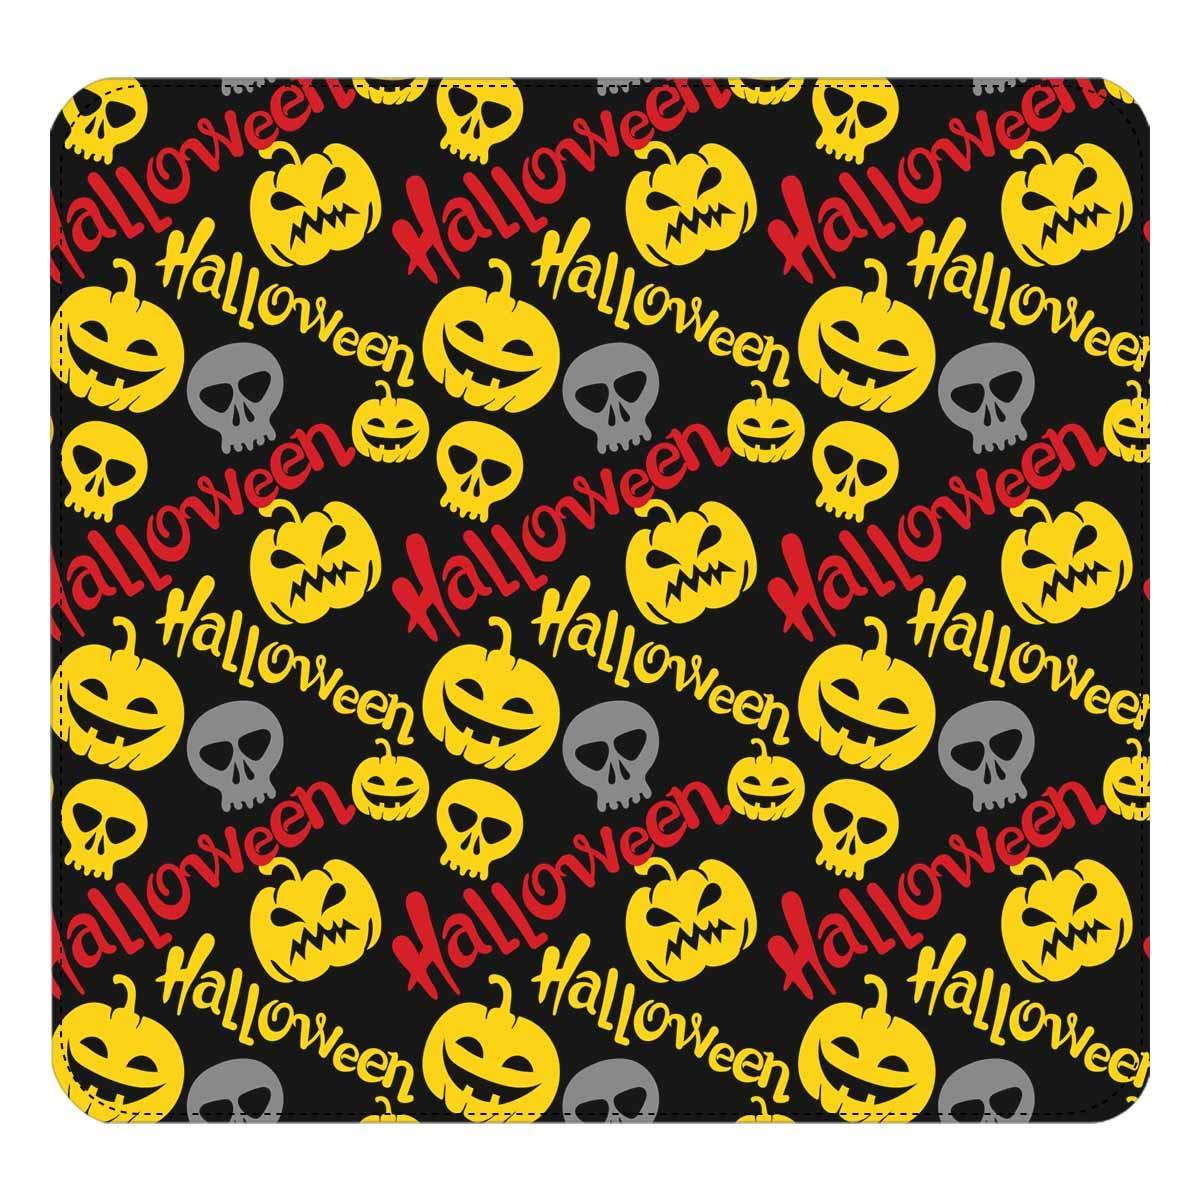 InterestPrint Womens Halloween Scary Pumpkins Clutch Purse Card Holder Organizer Ladies Purse